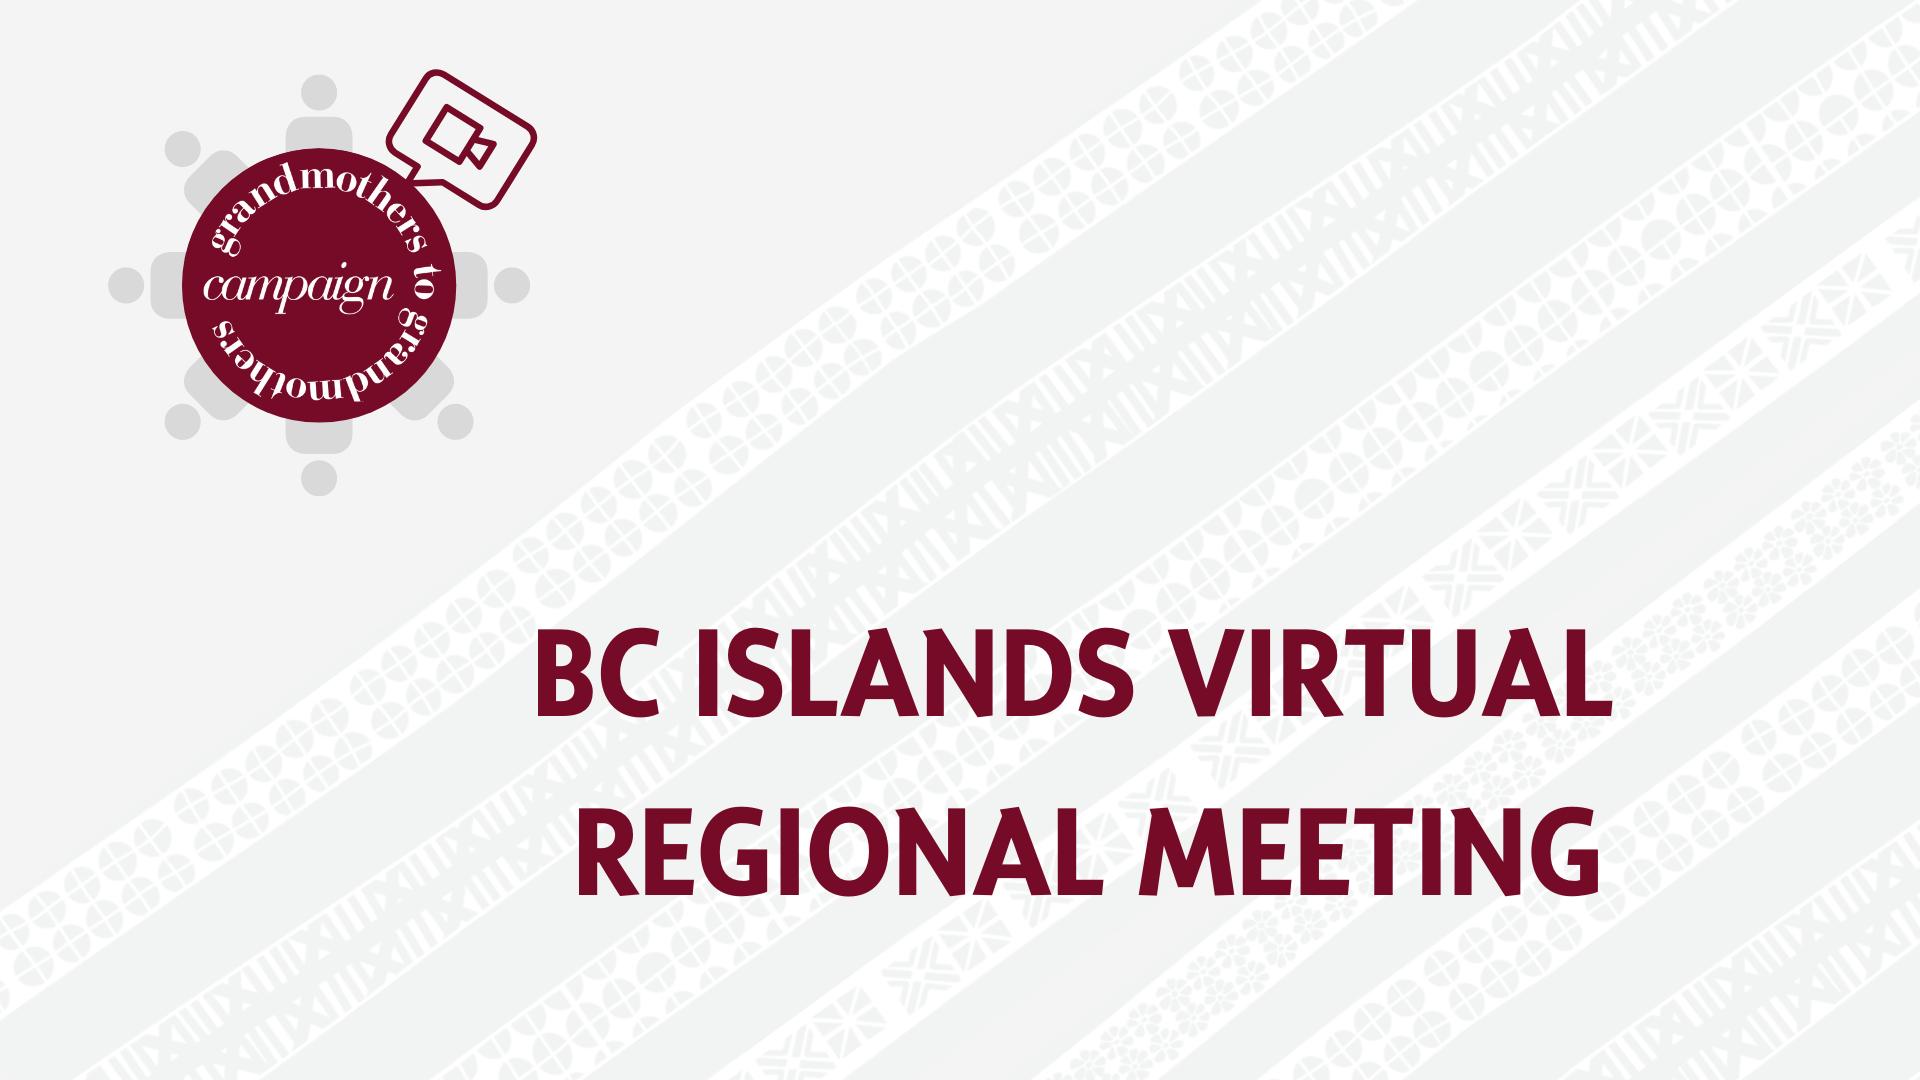 BC Islands Virtual Regional Meeting